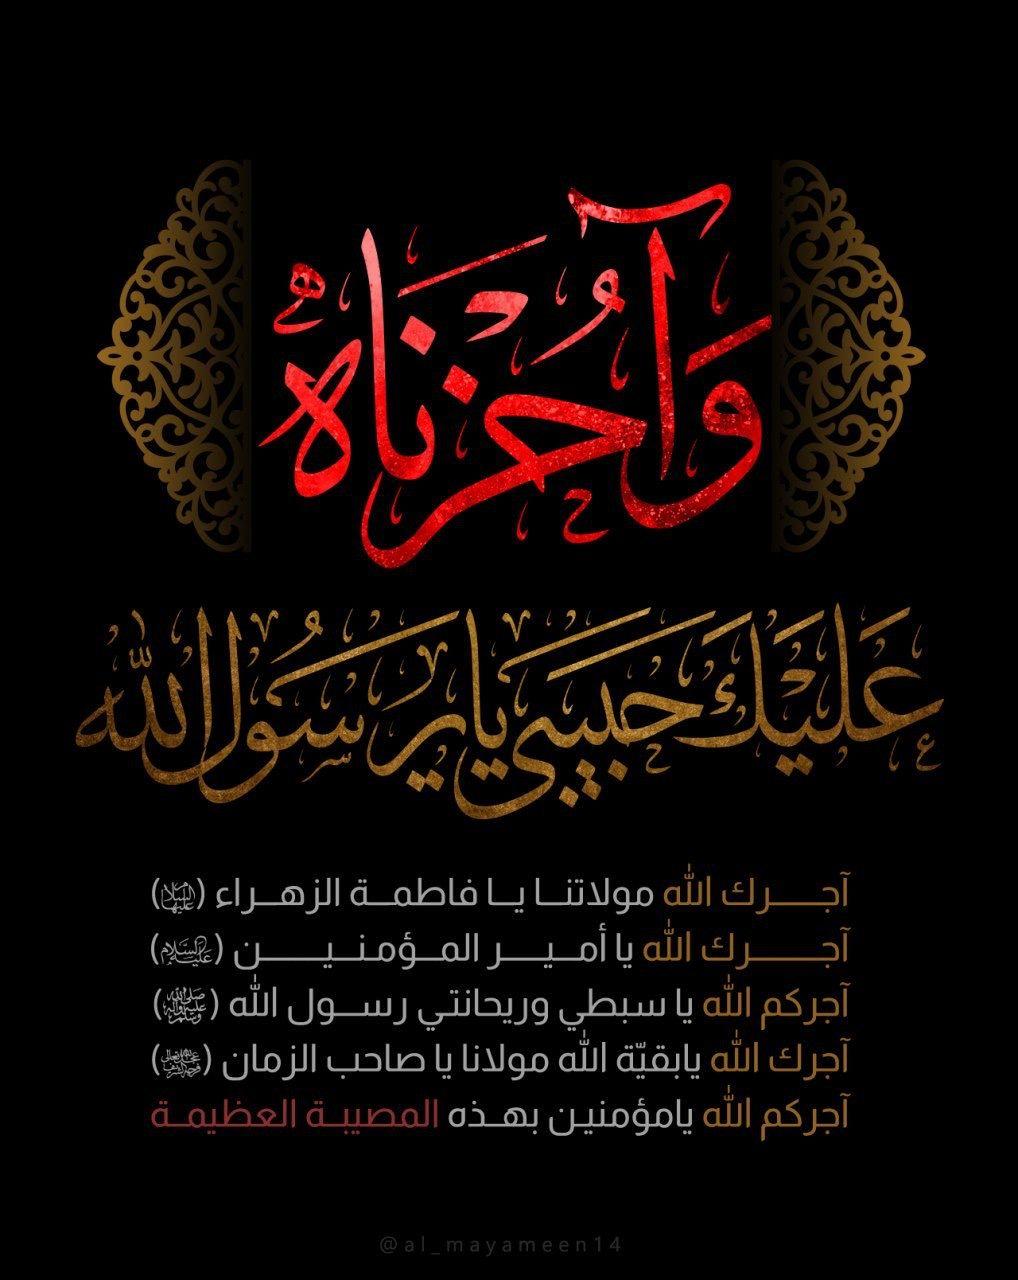 Pin By Ahmed Alabdullah On ذكرى وفاة الرسول محمد ع Movie Posters Sal Poster